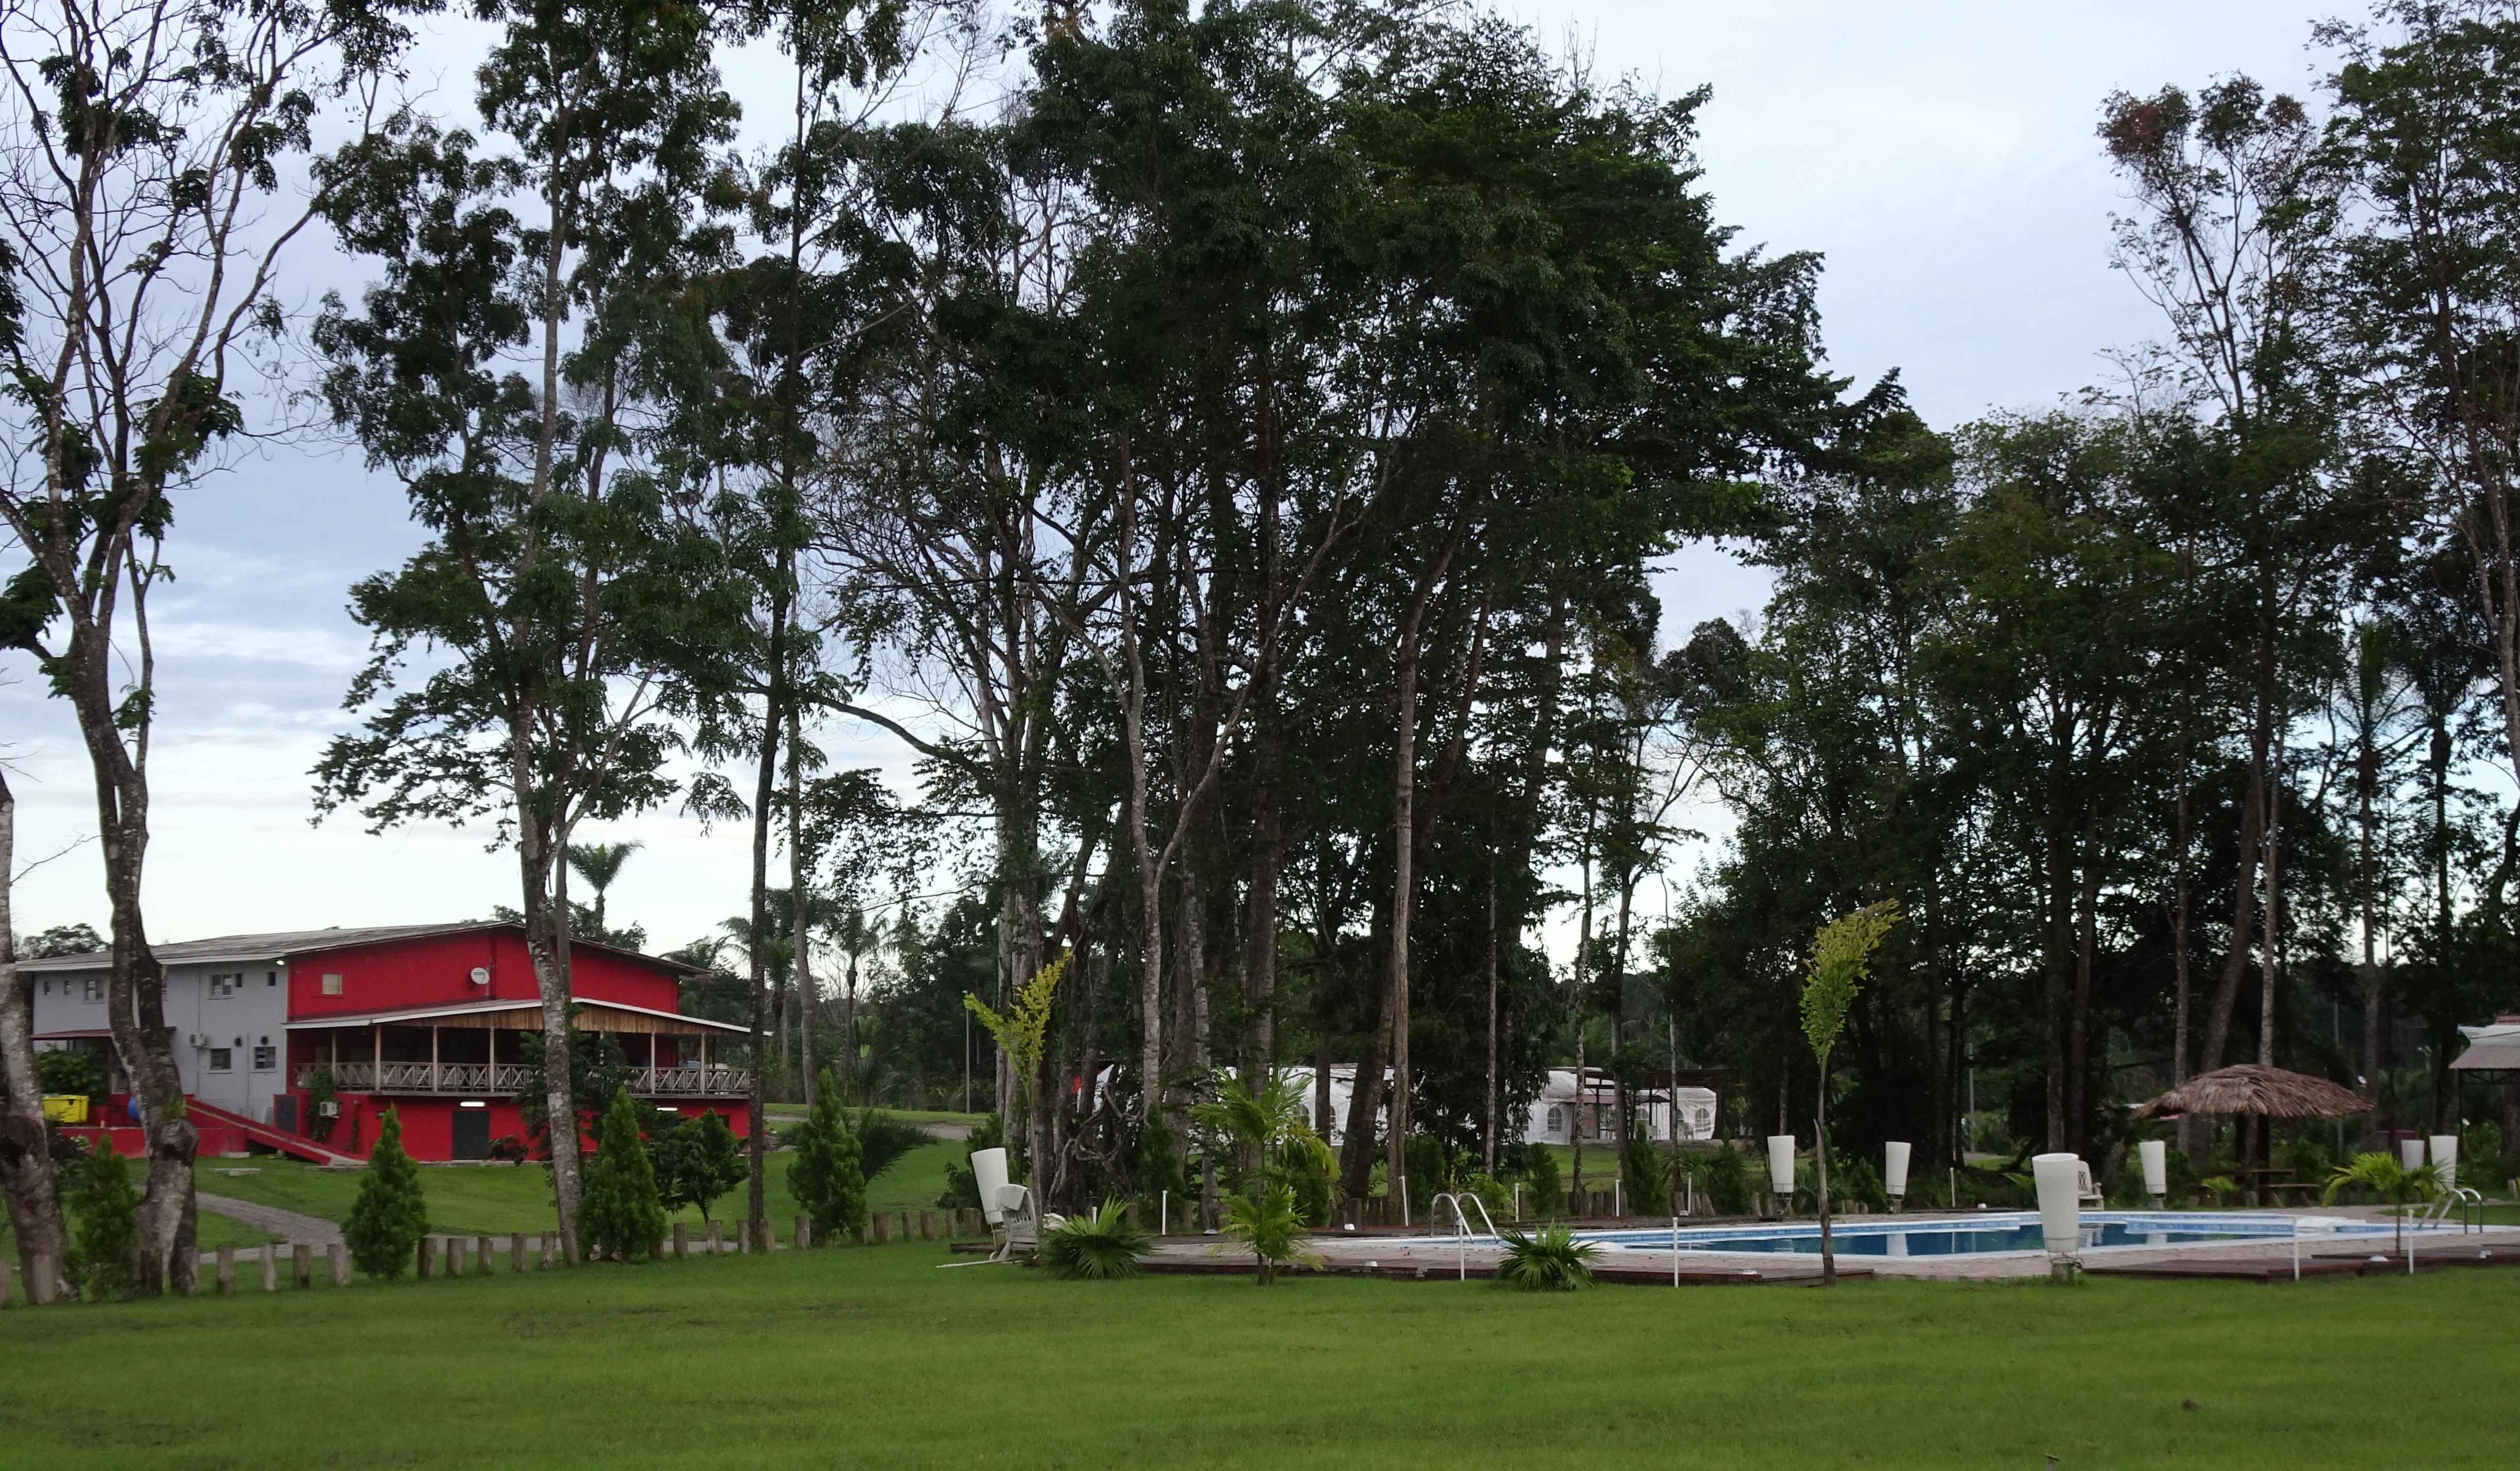 Dounia Park